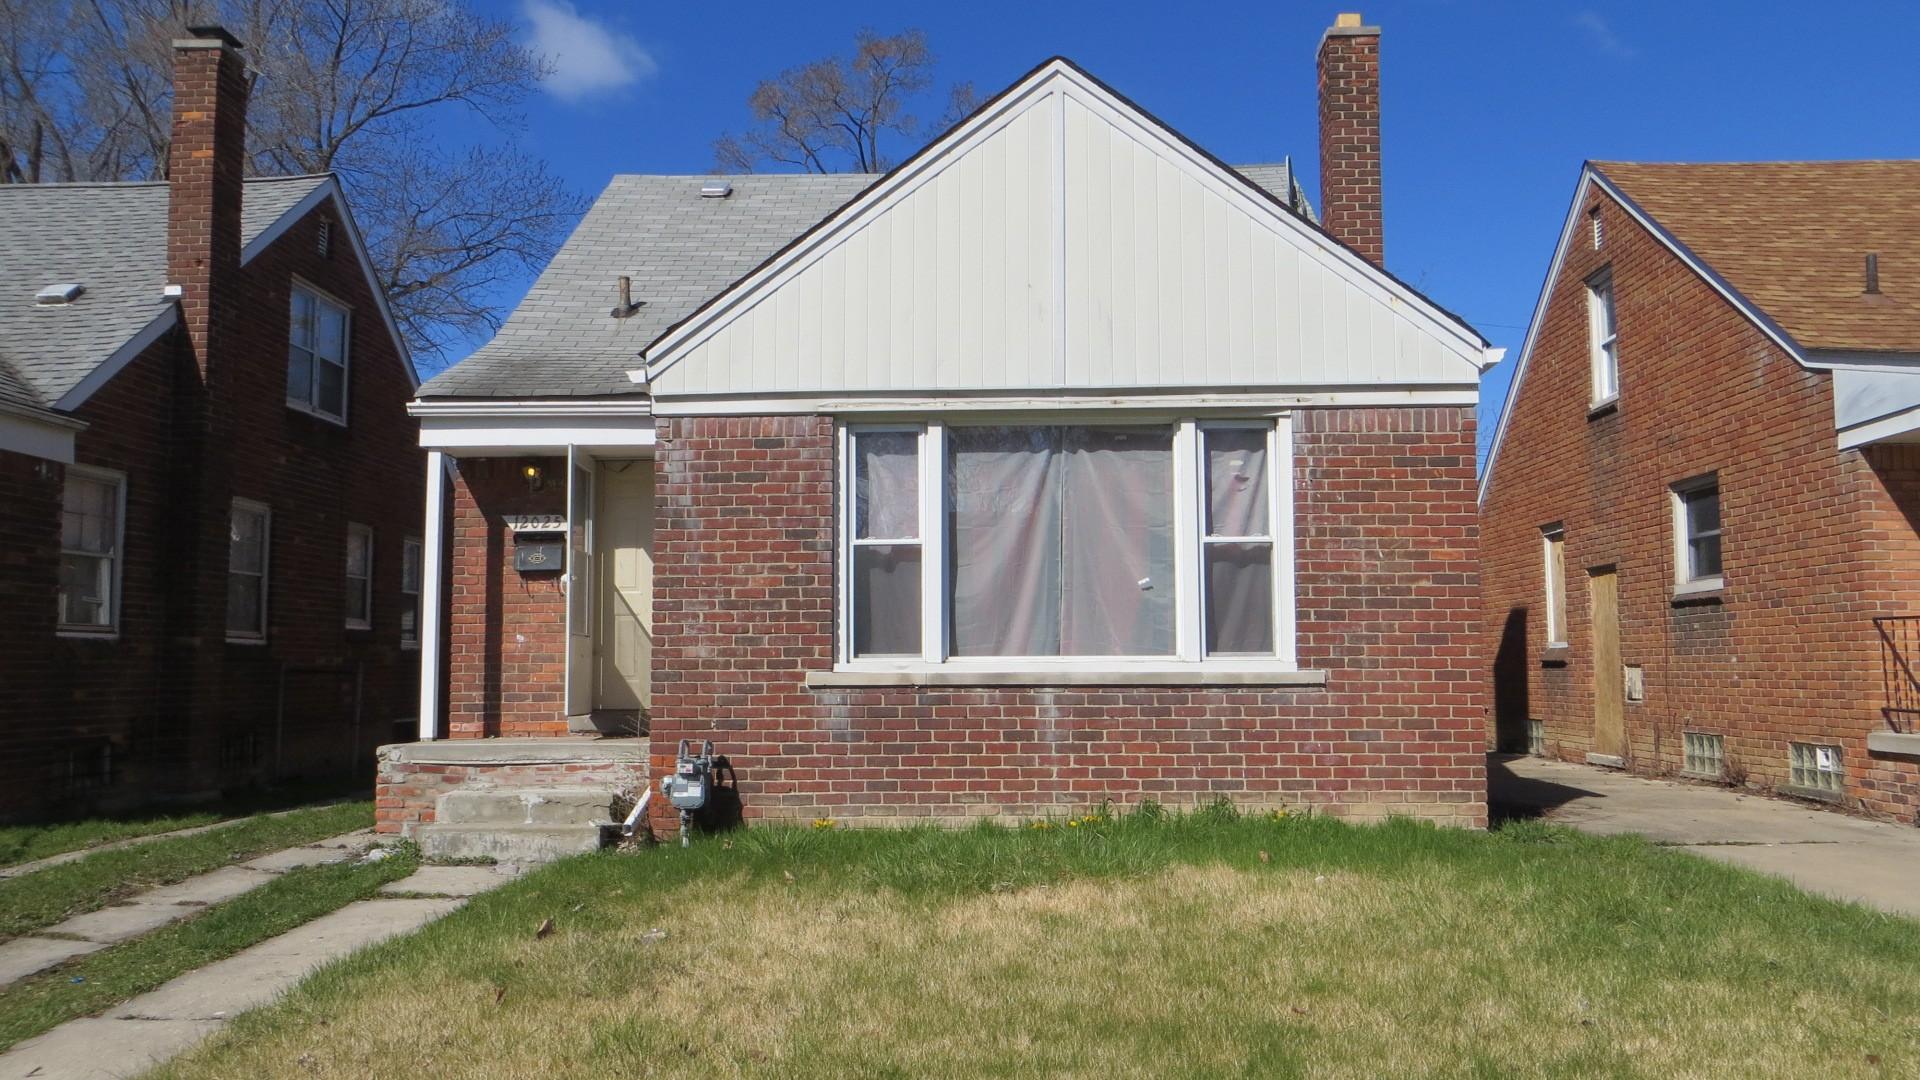 12025 Faust Ave Detroit Mi 48228 3 Bedroom Apartment For Rent For 800 Month Zumper